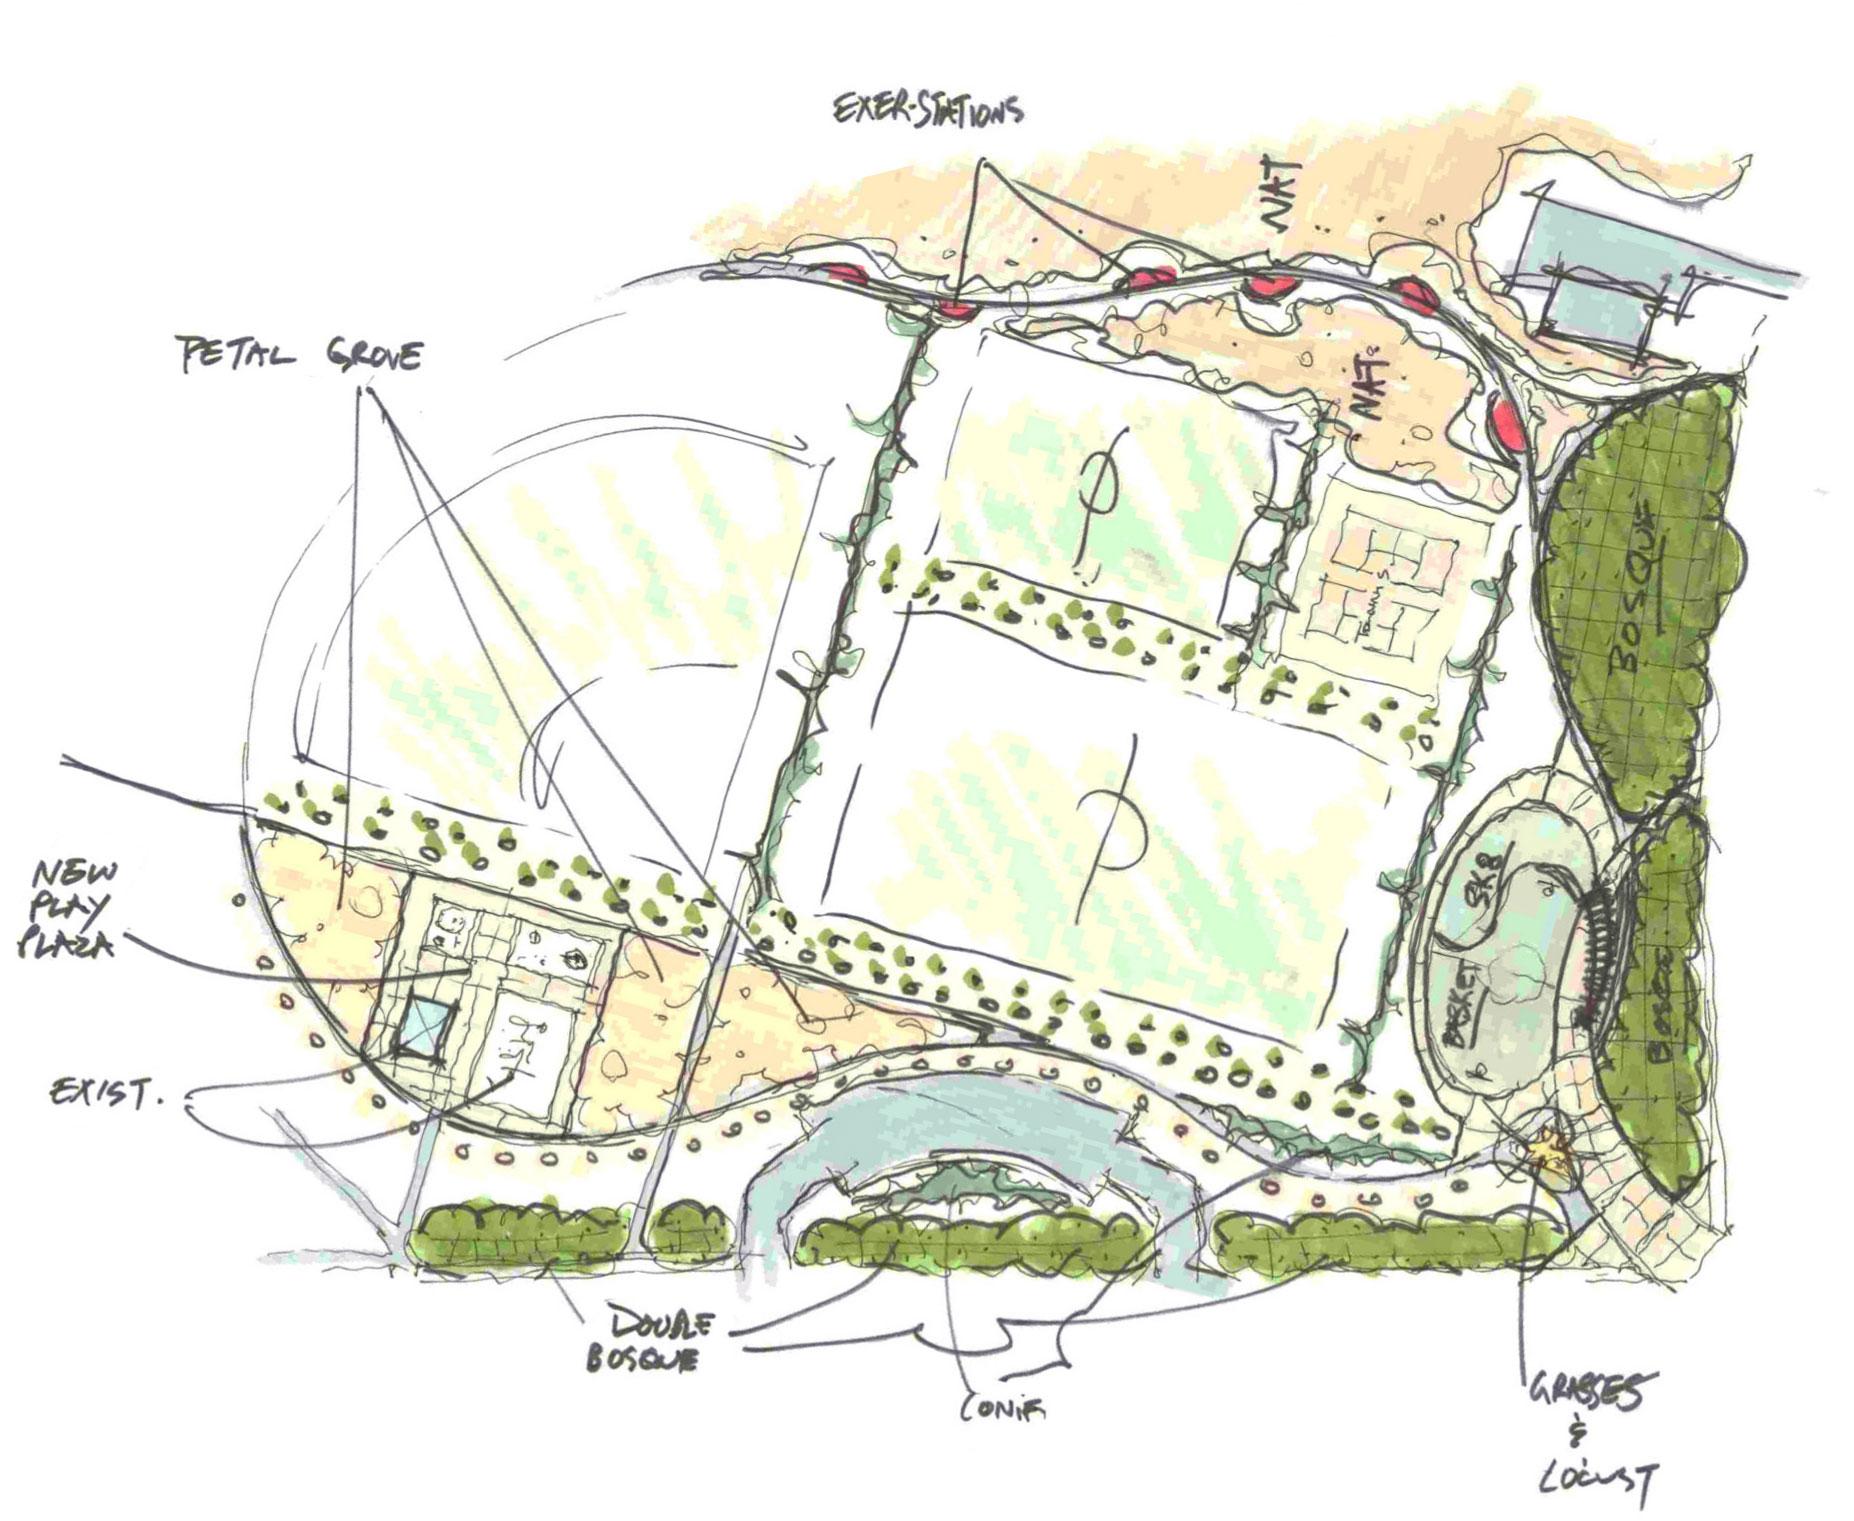 Berzcy Park- Plan Sketch-01.jpg